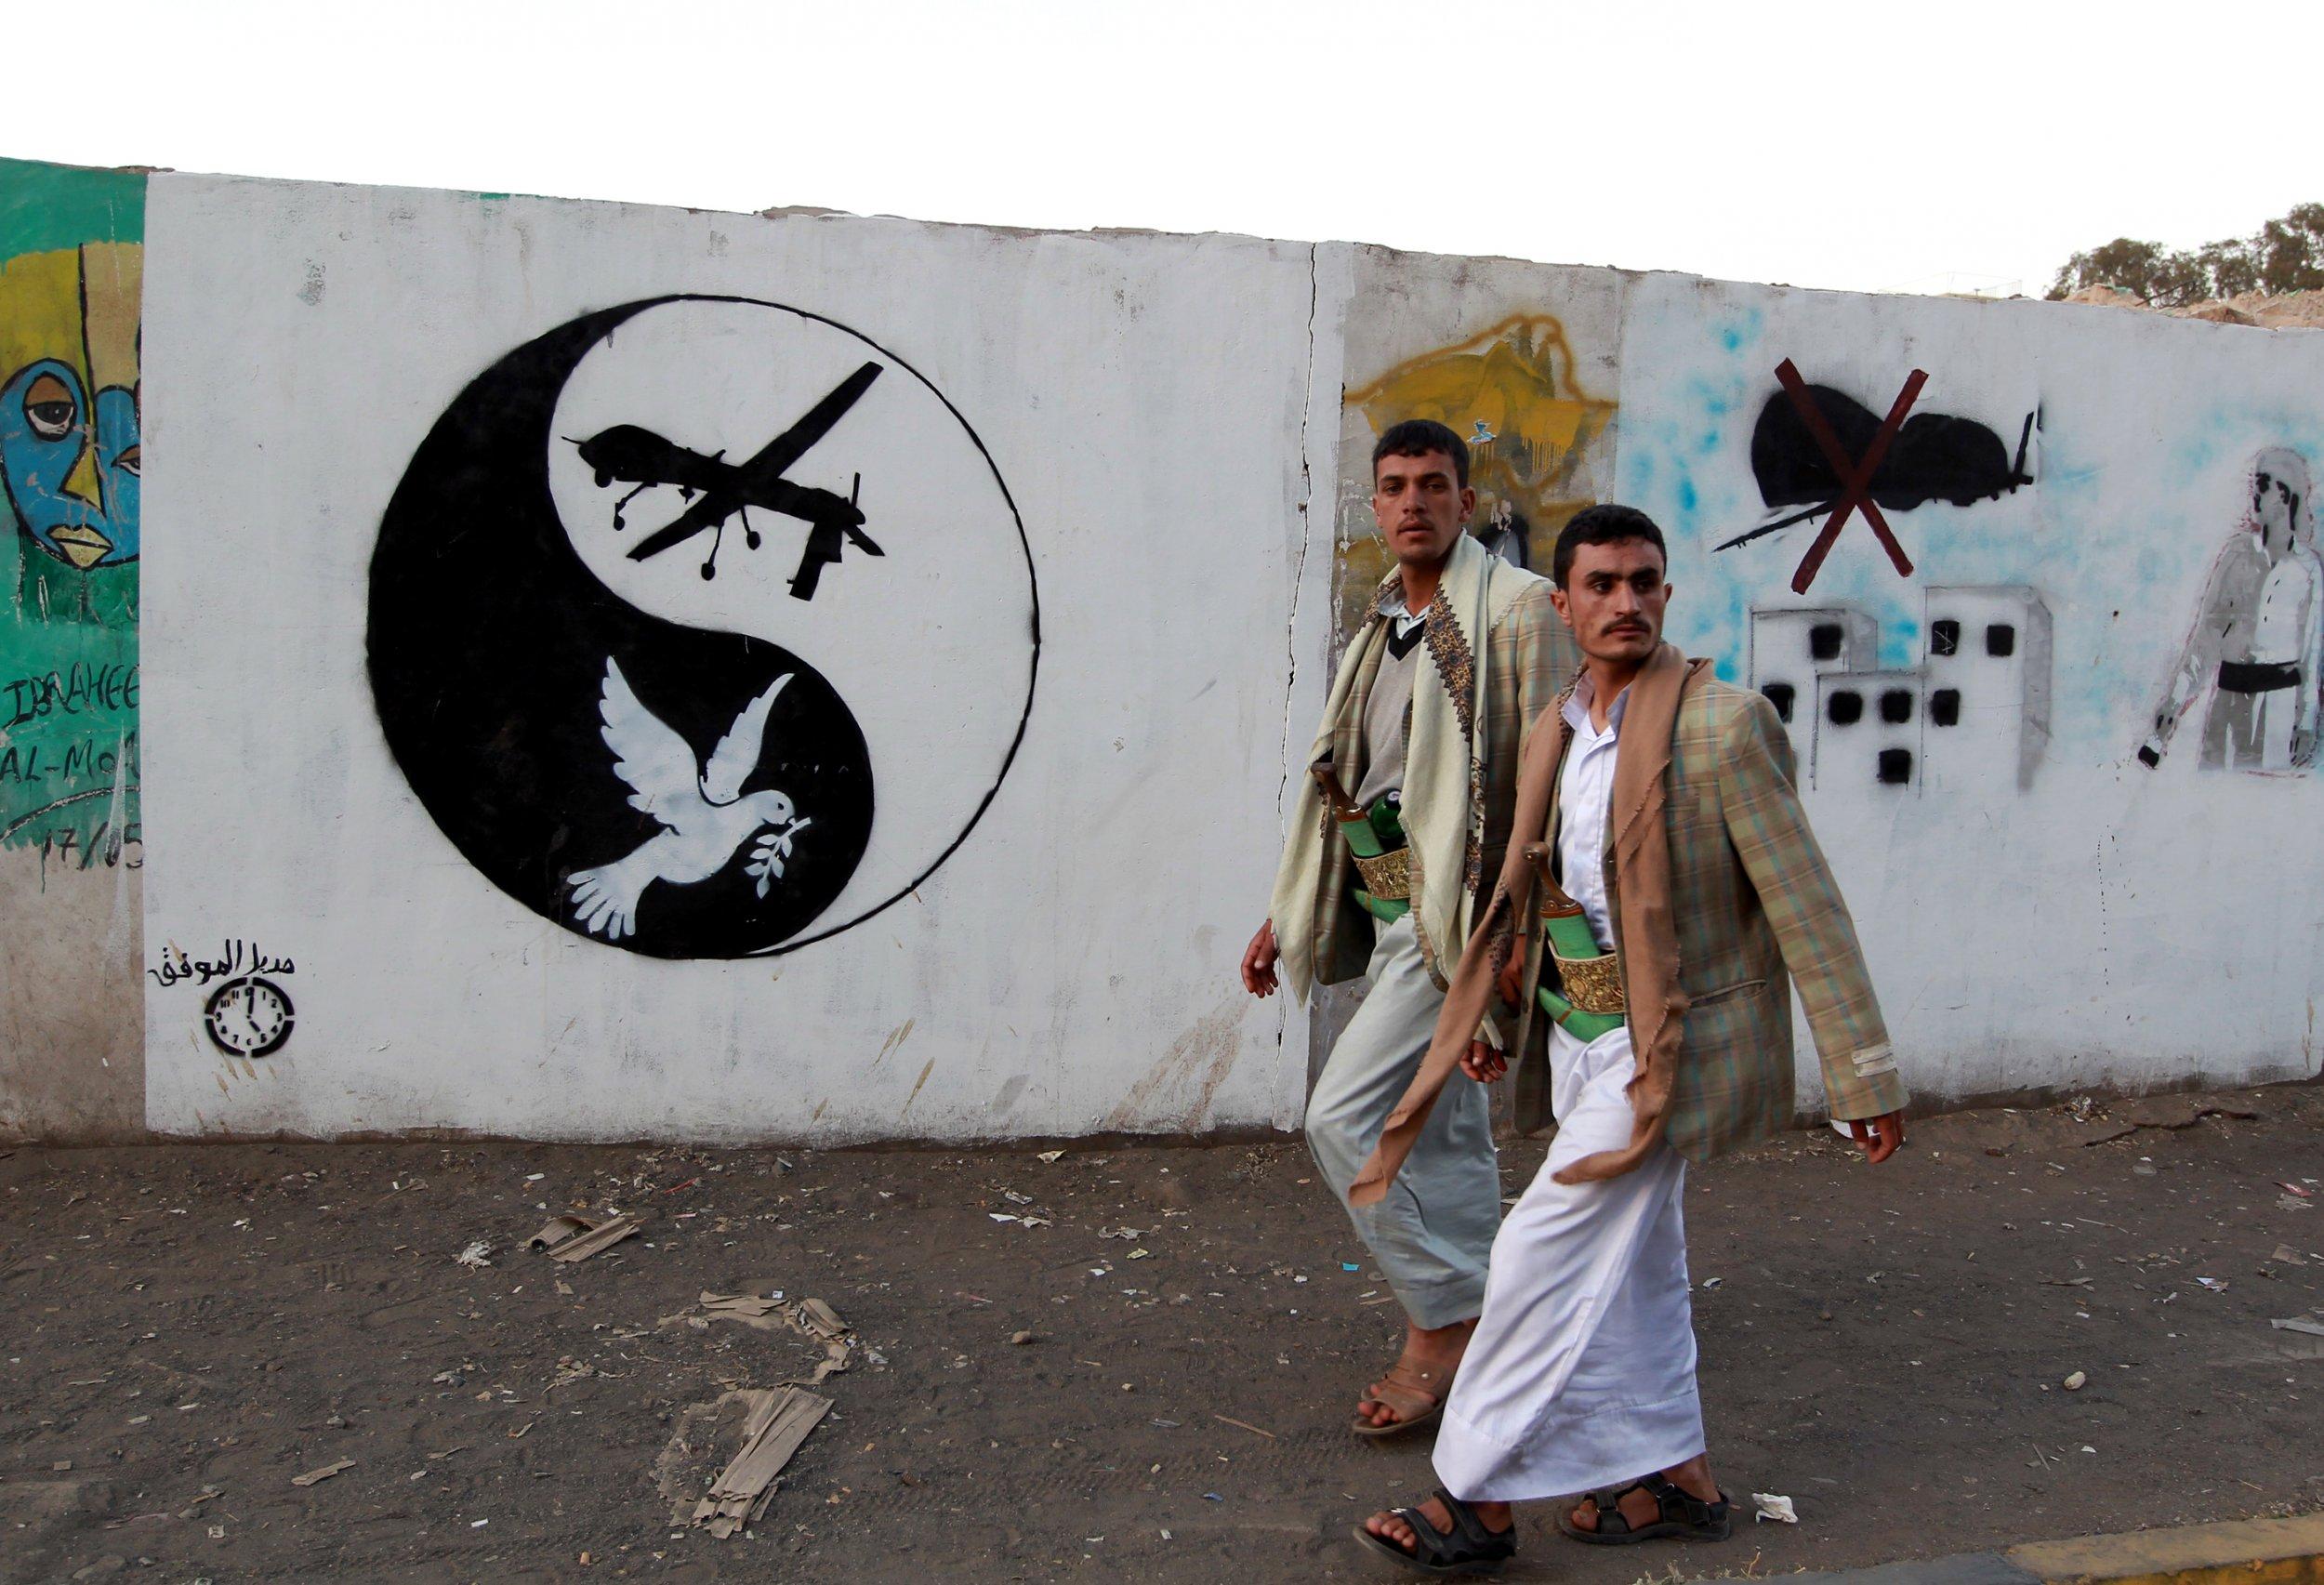 Yemeni man walks past drone art in Yemen